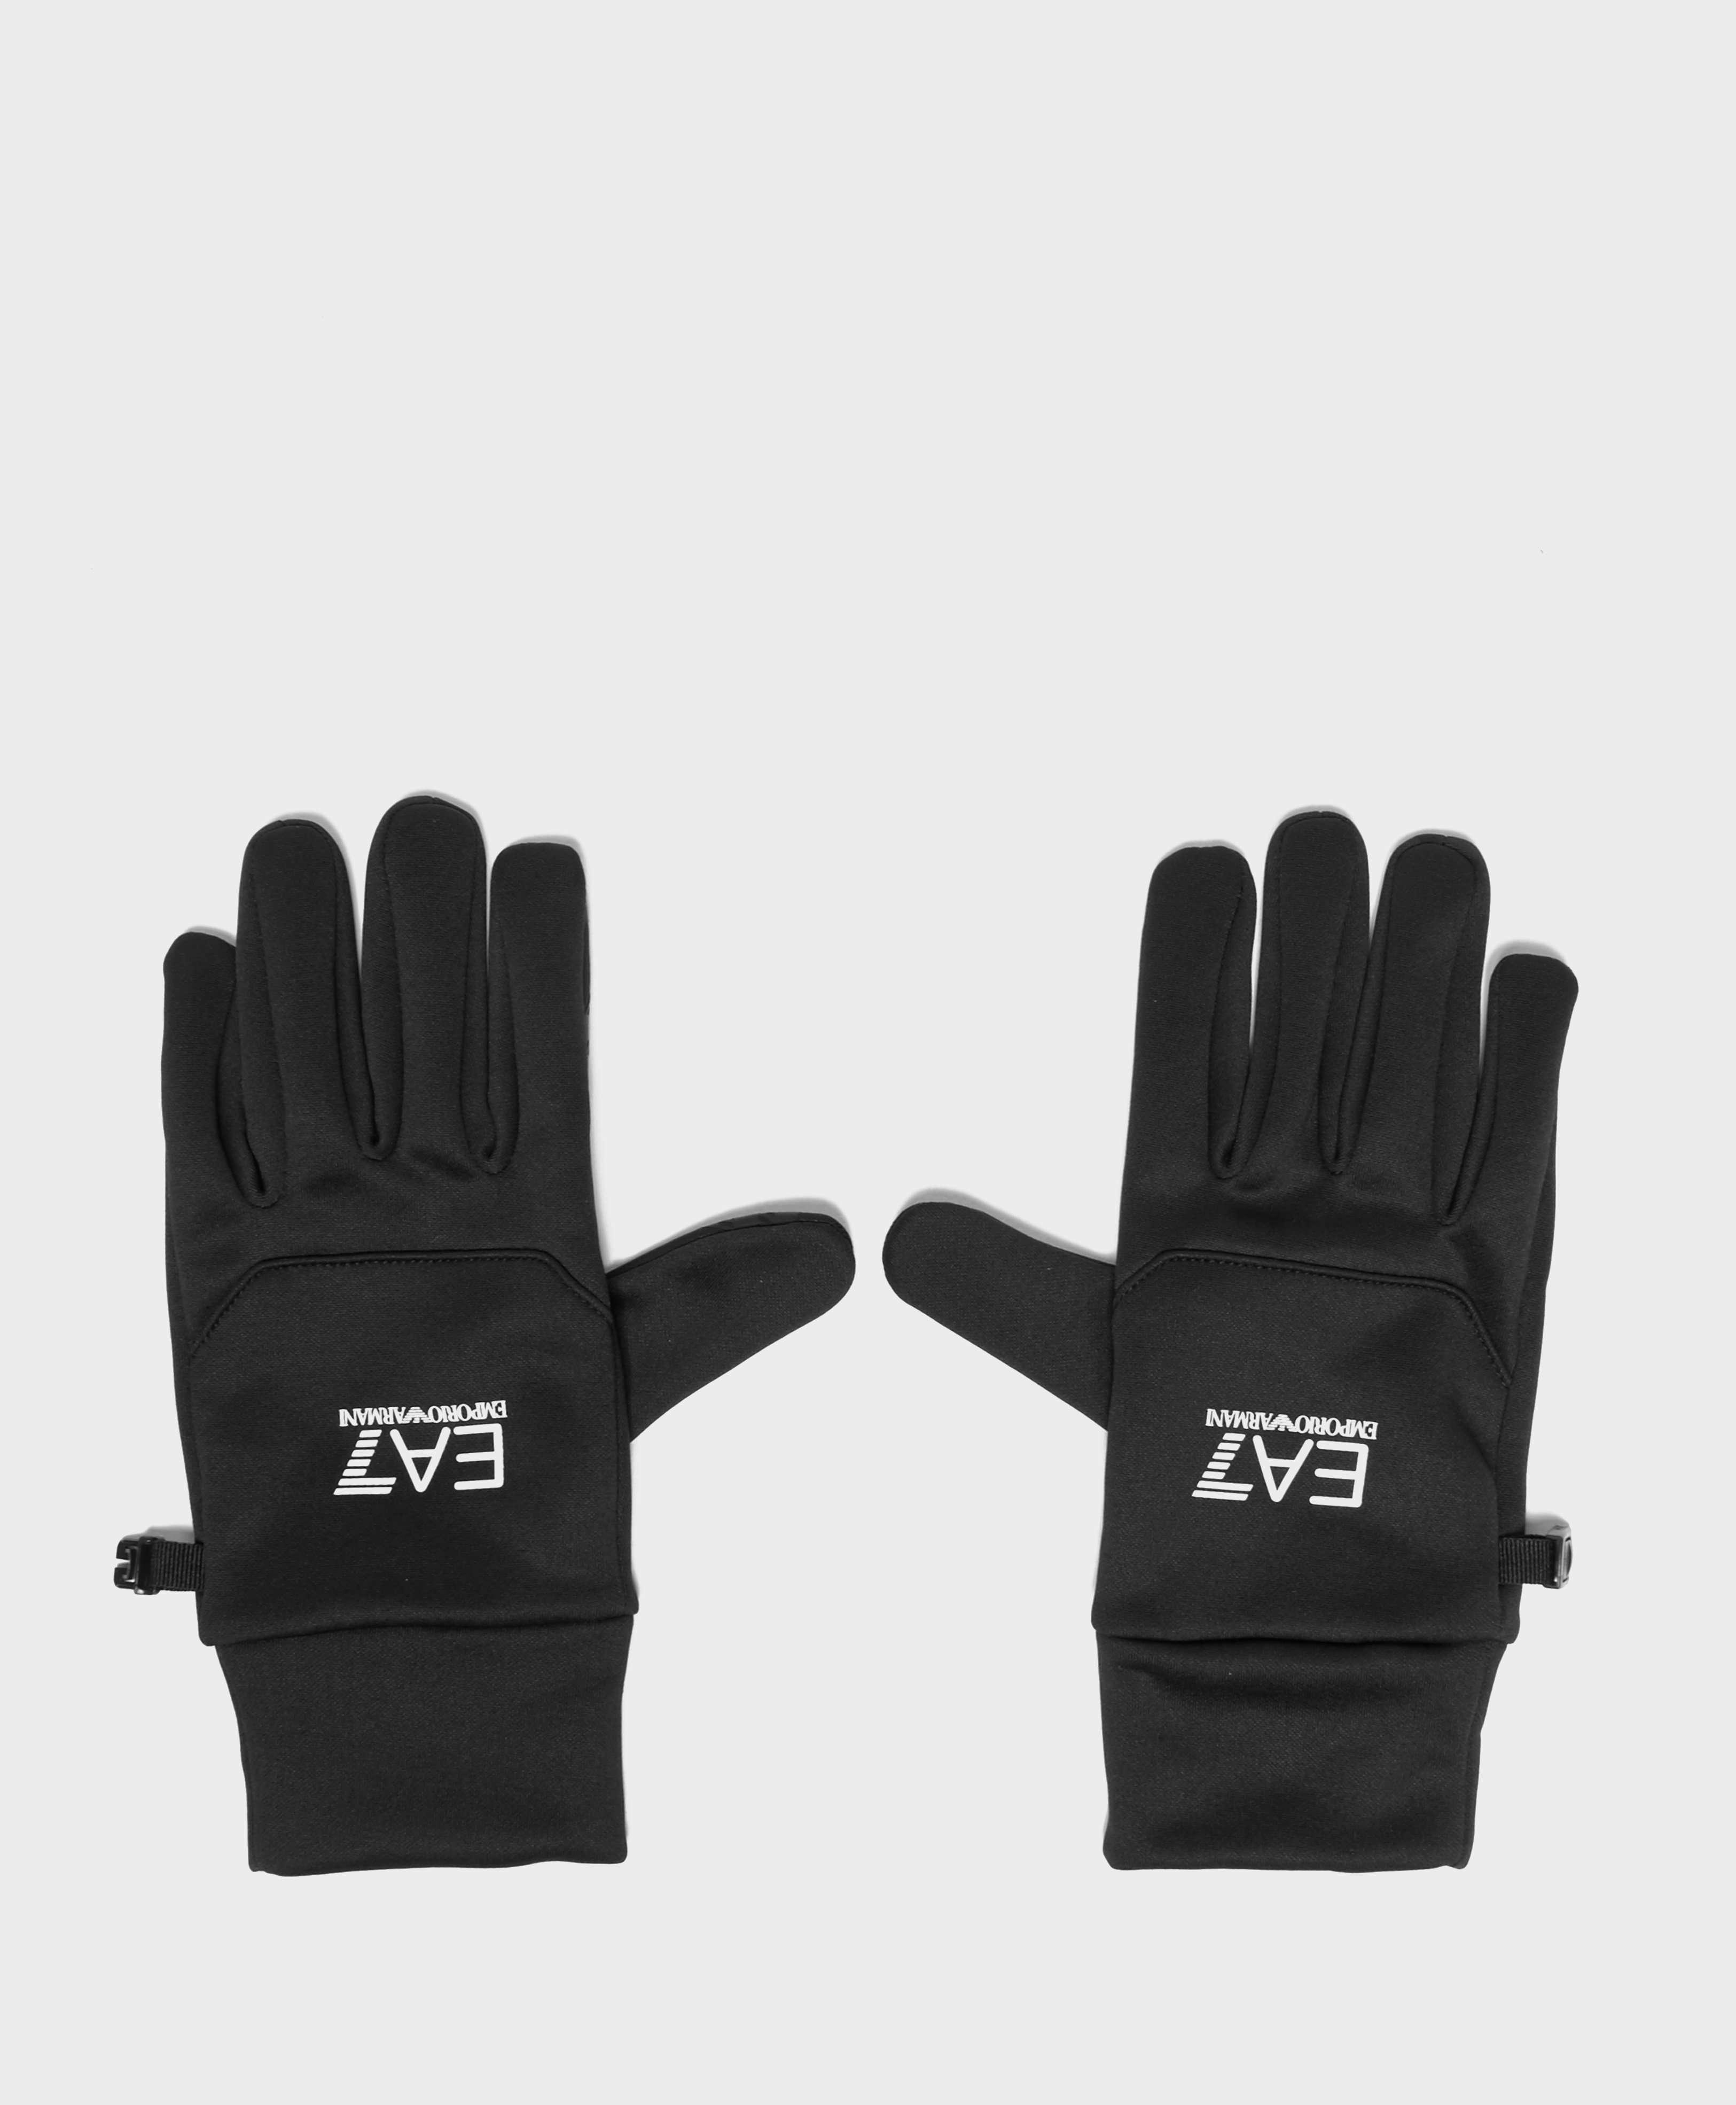 Emporio Armani EA7 7 Lines Glove